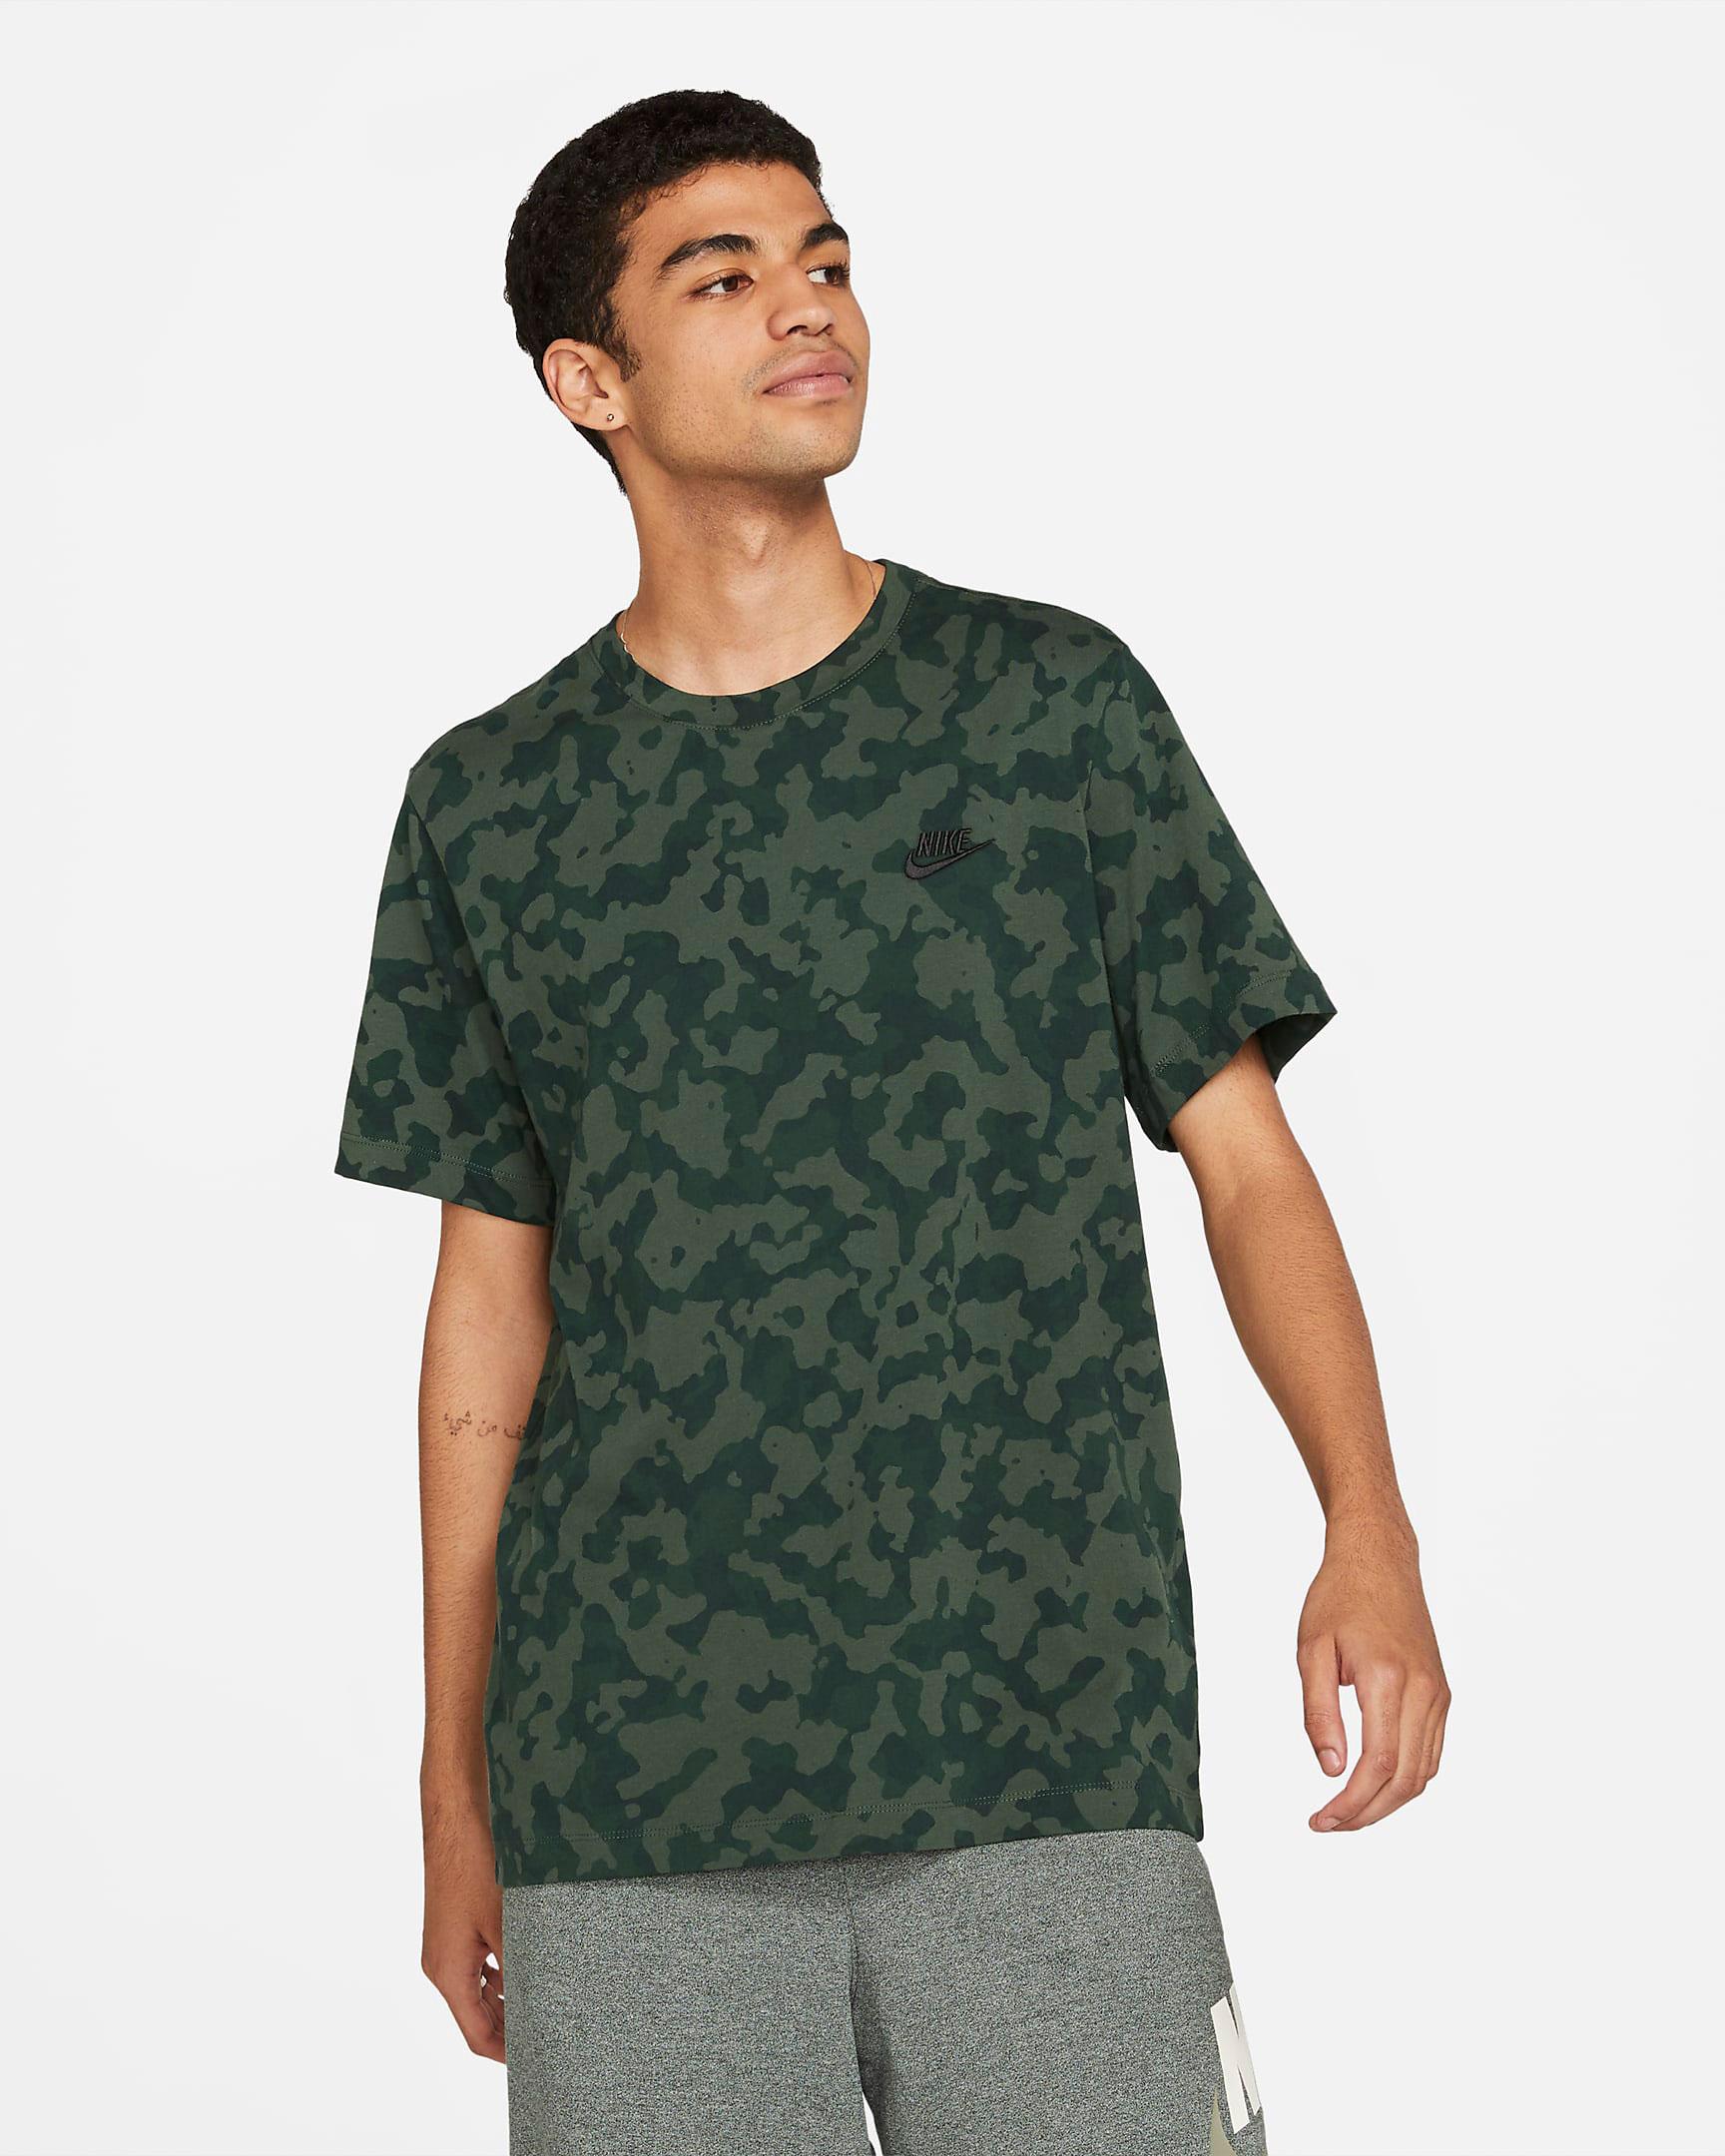 nike-galactic-jade-camo-shirt